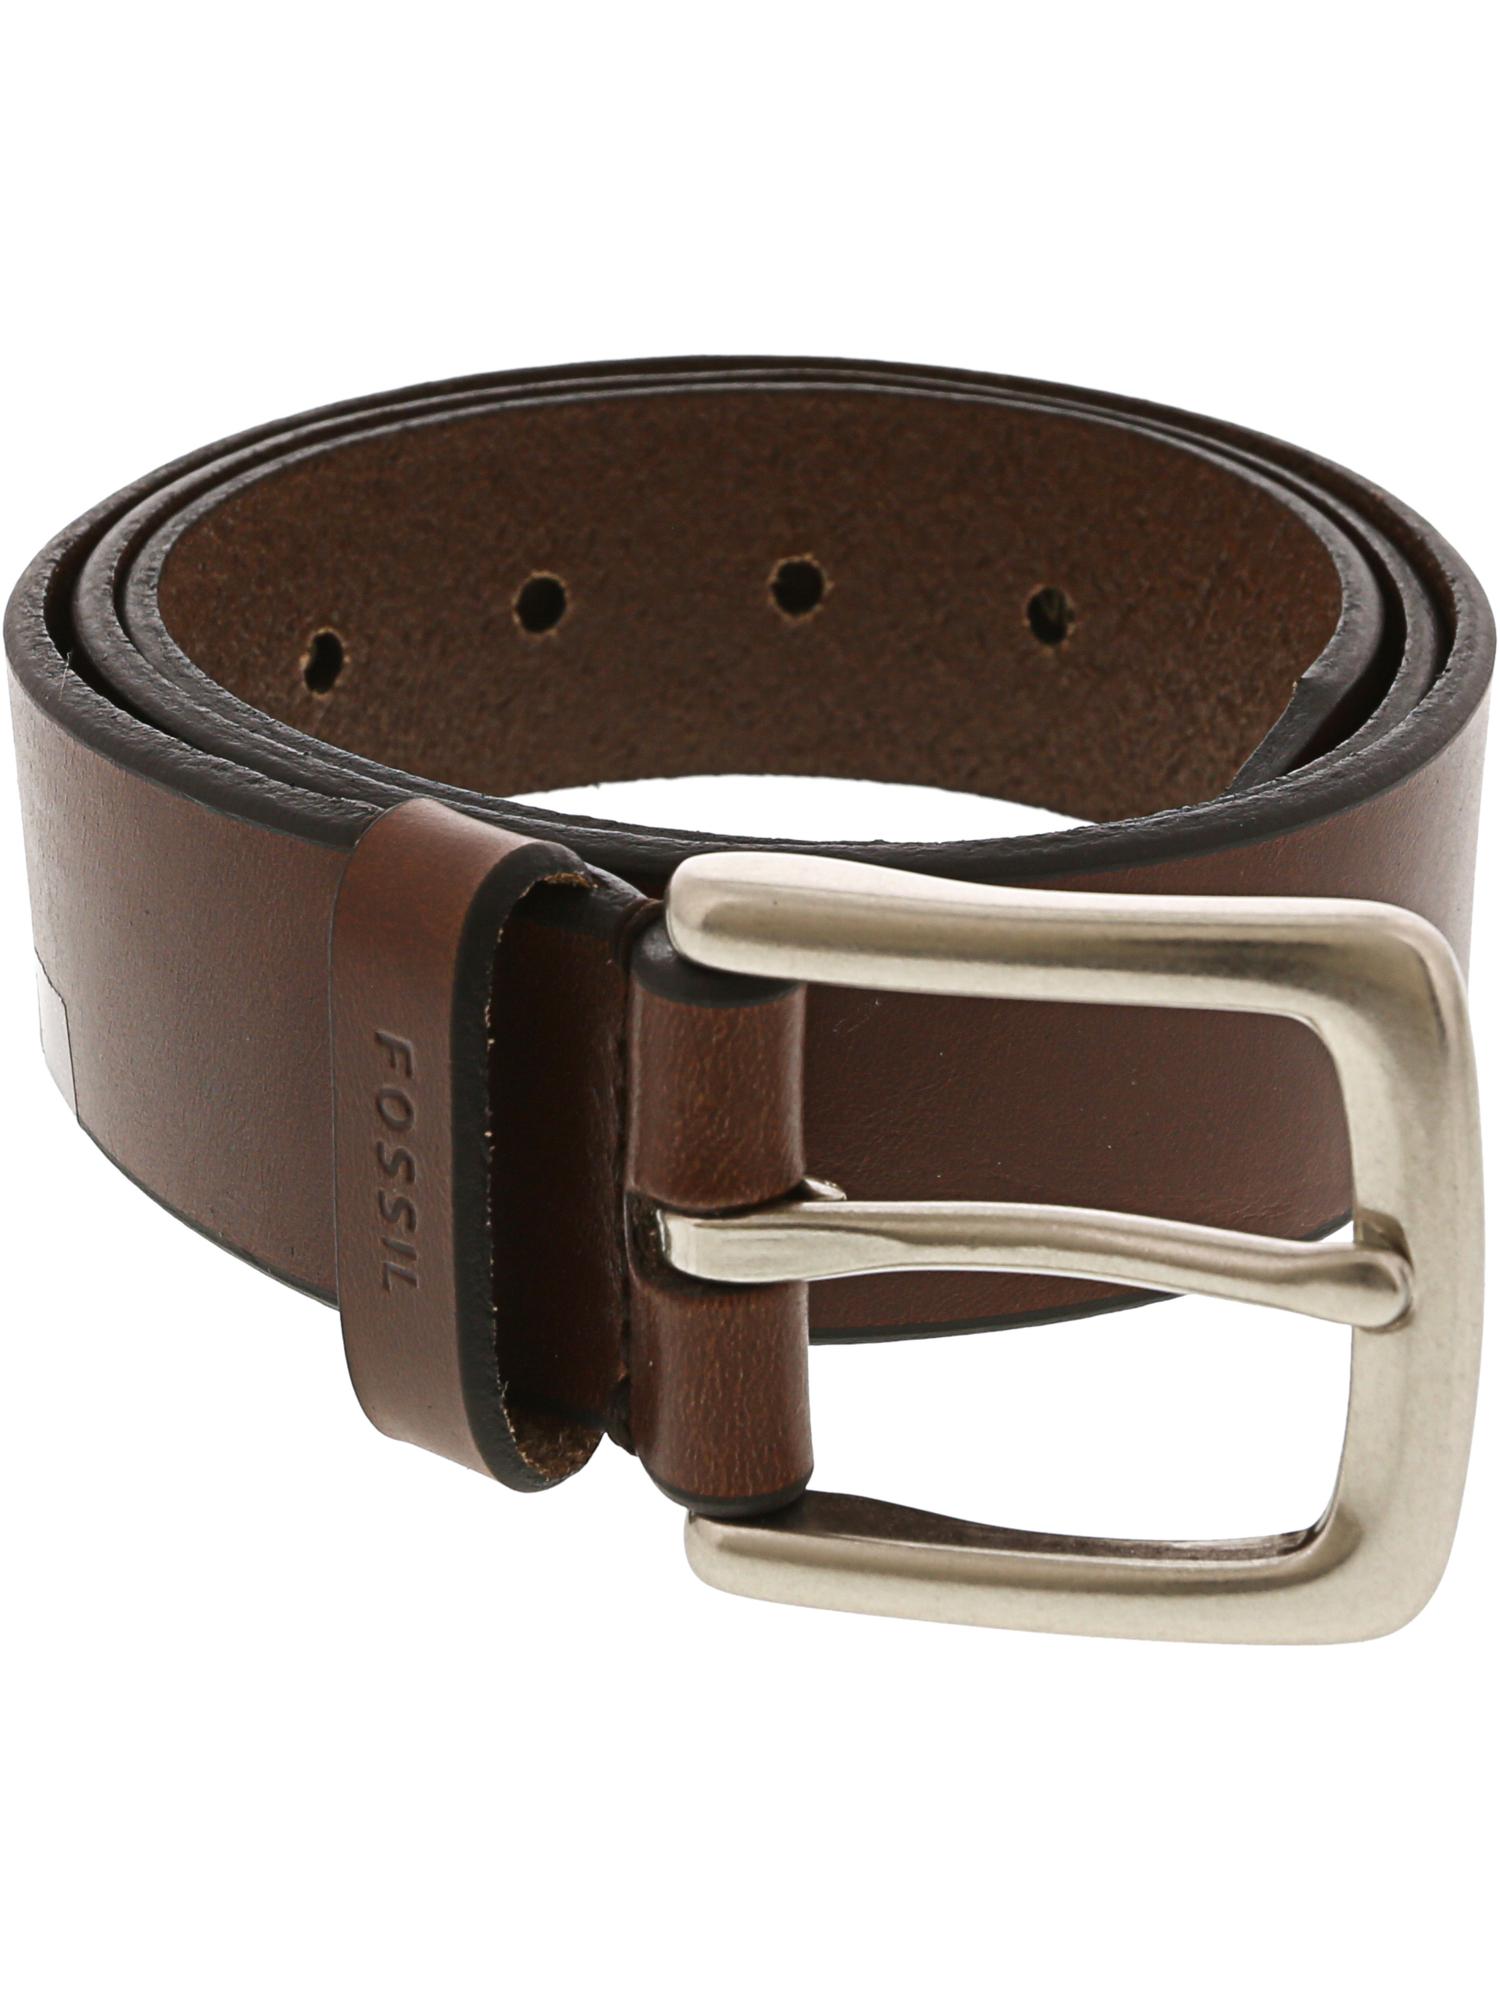 Fossil-Men-039-s-Joe-Leather-Belt thumbnail 17